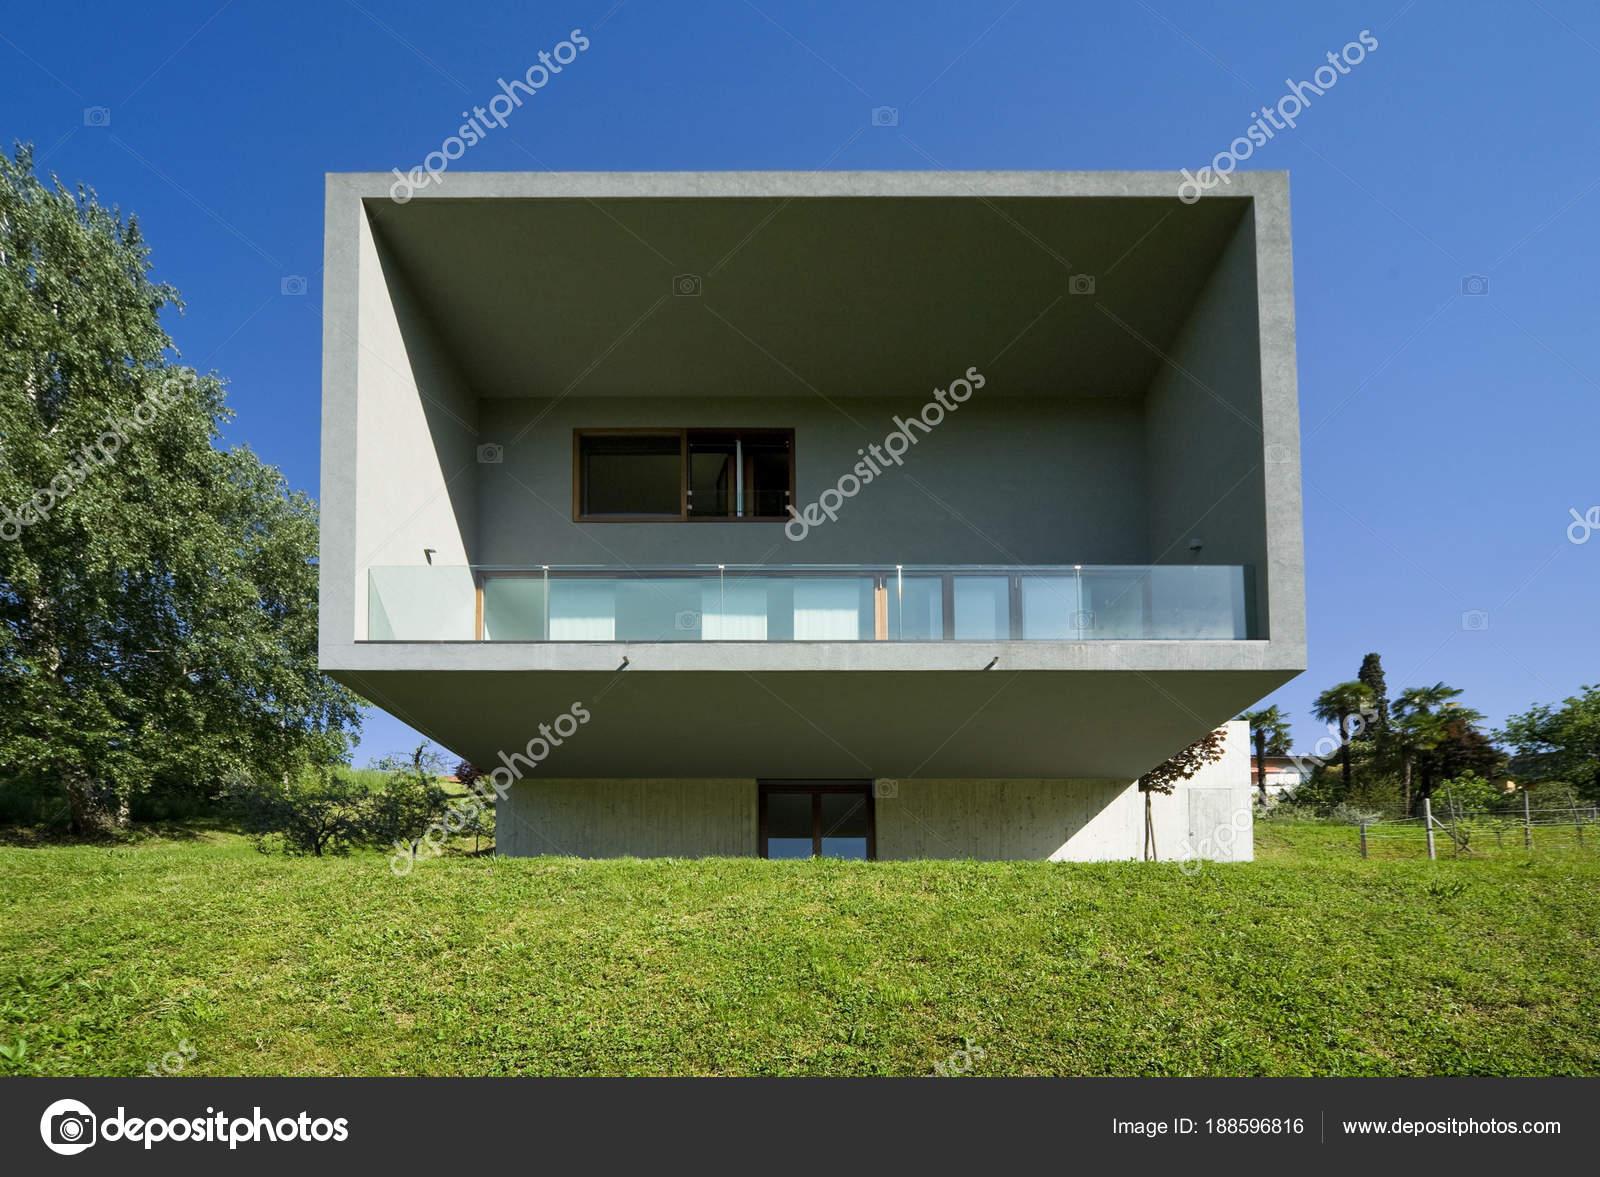 Exterieur moderne stijl villa u2014 stockfoto © zveiger #188596816